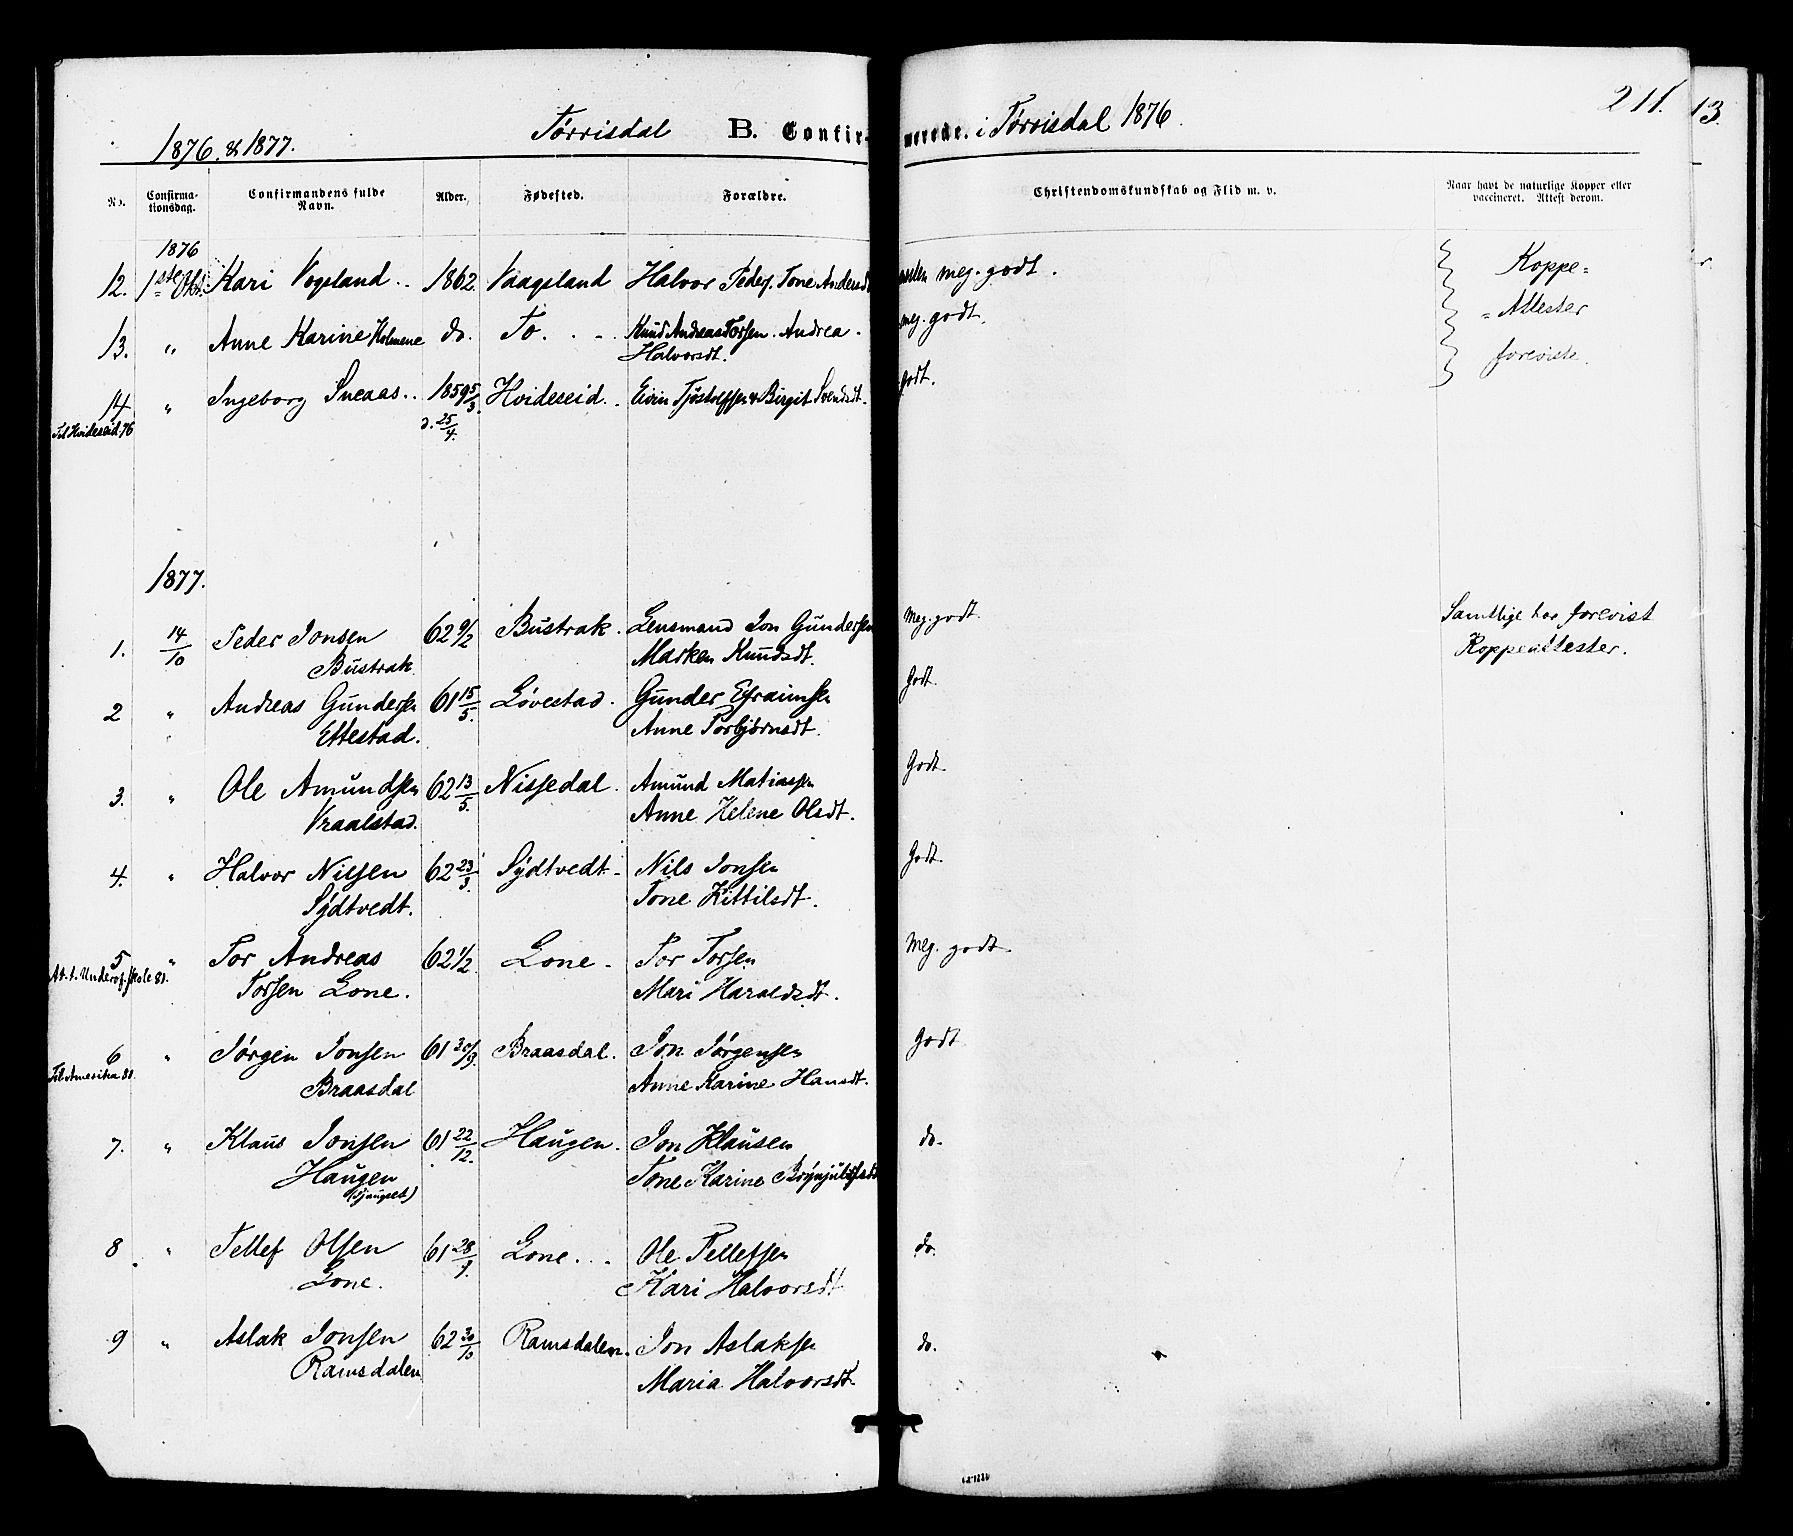 SAKO, Drangedal kirkebøker, F/Fa/L0009: Ministerialbok nr. 9 /2, 1872-1884, s. 211